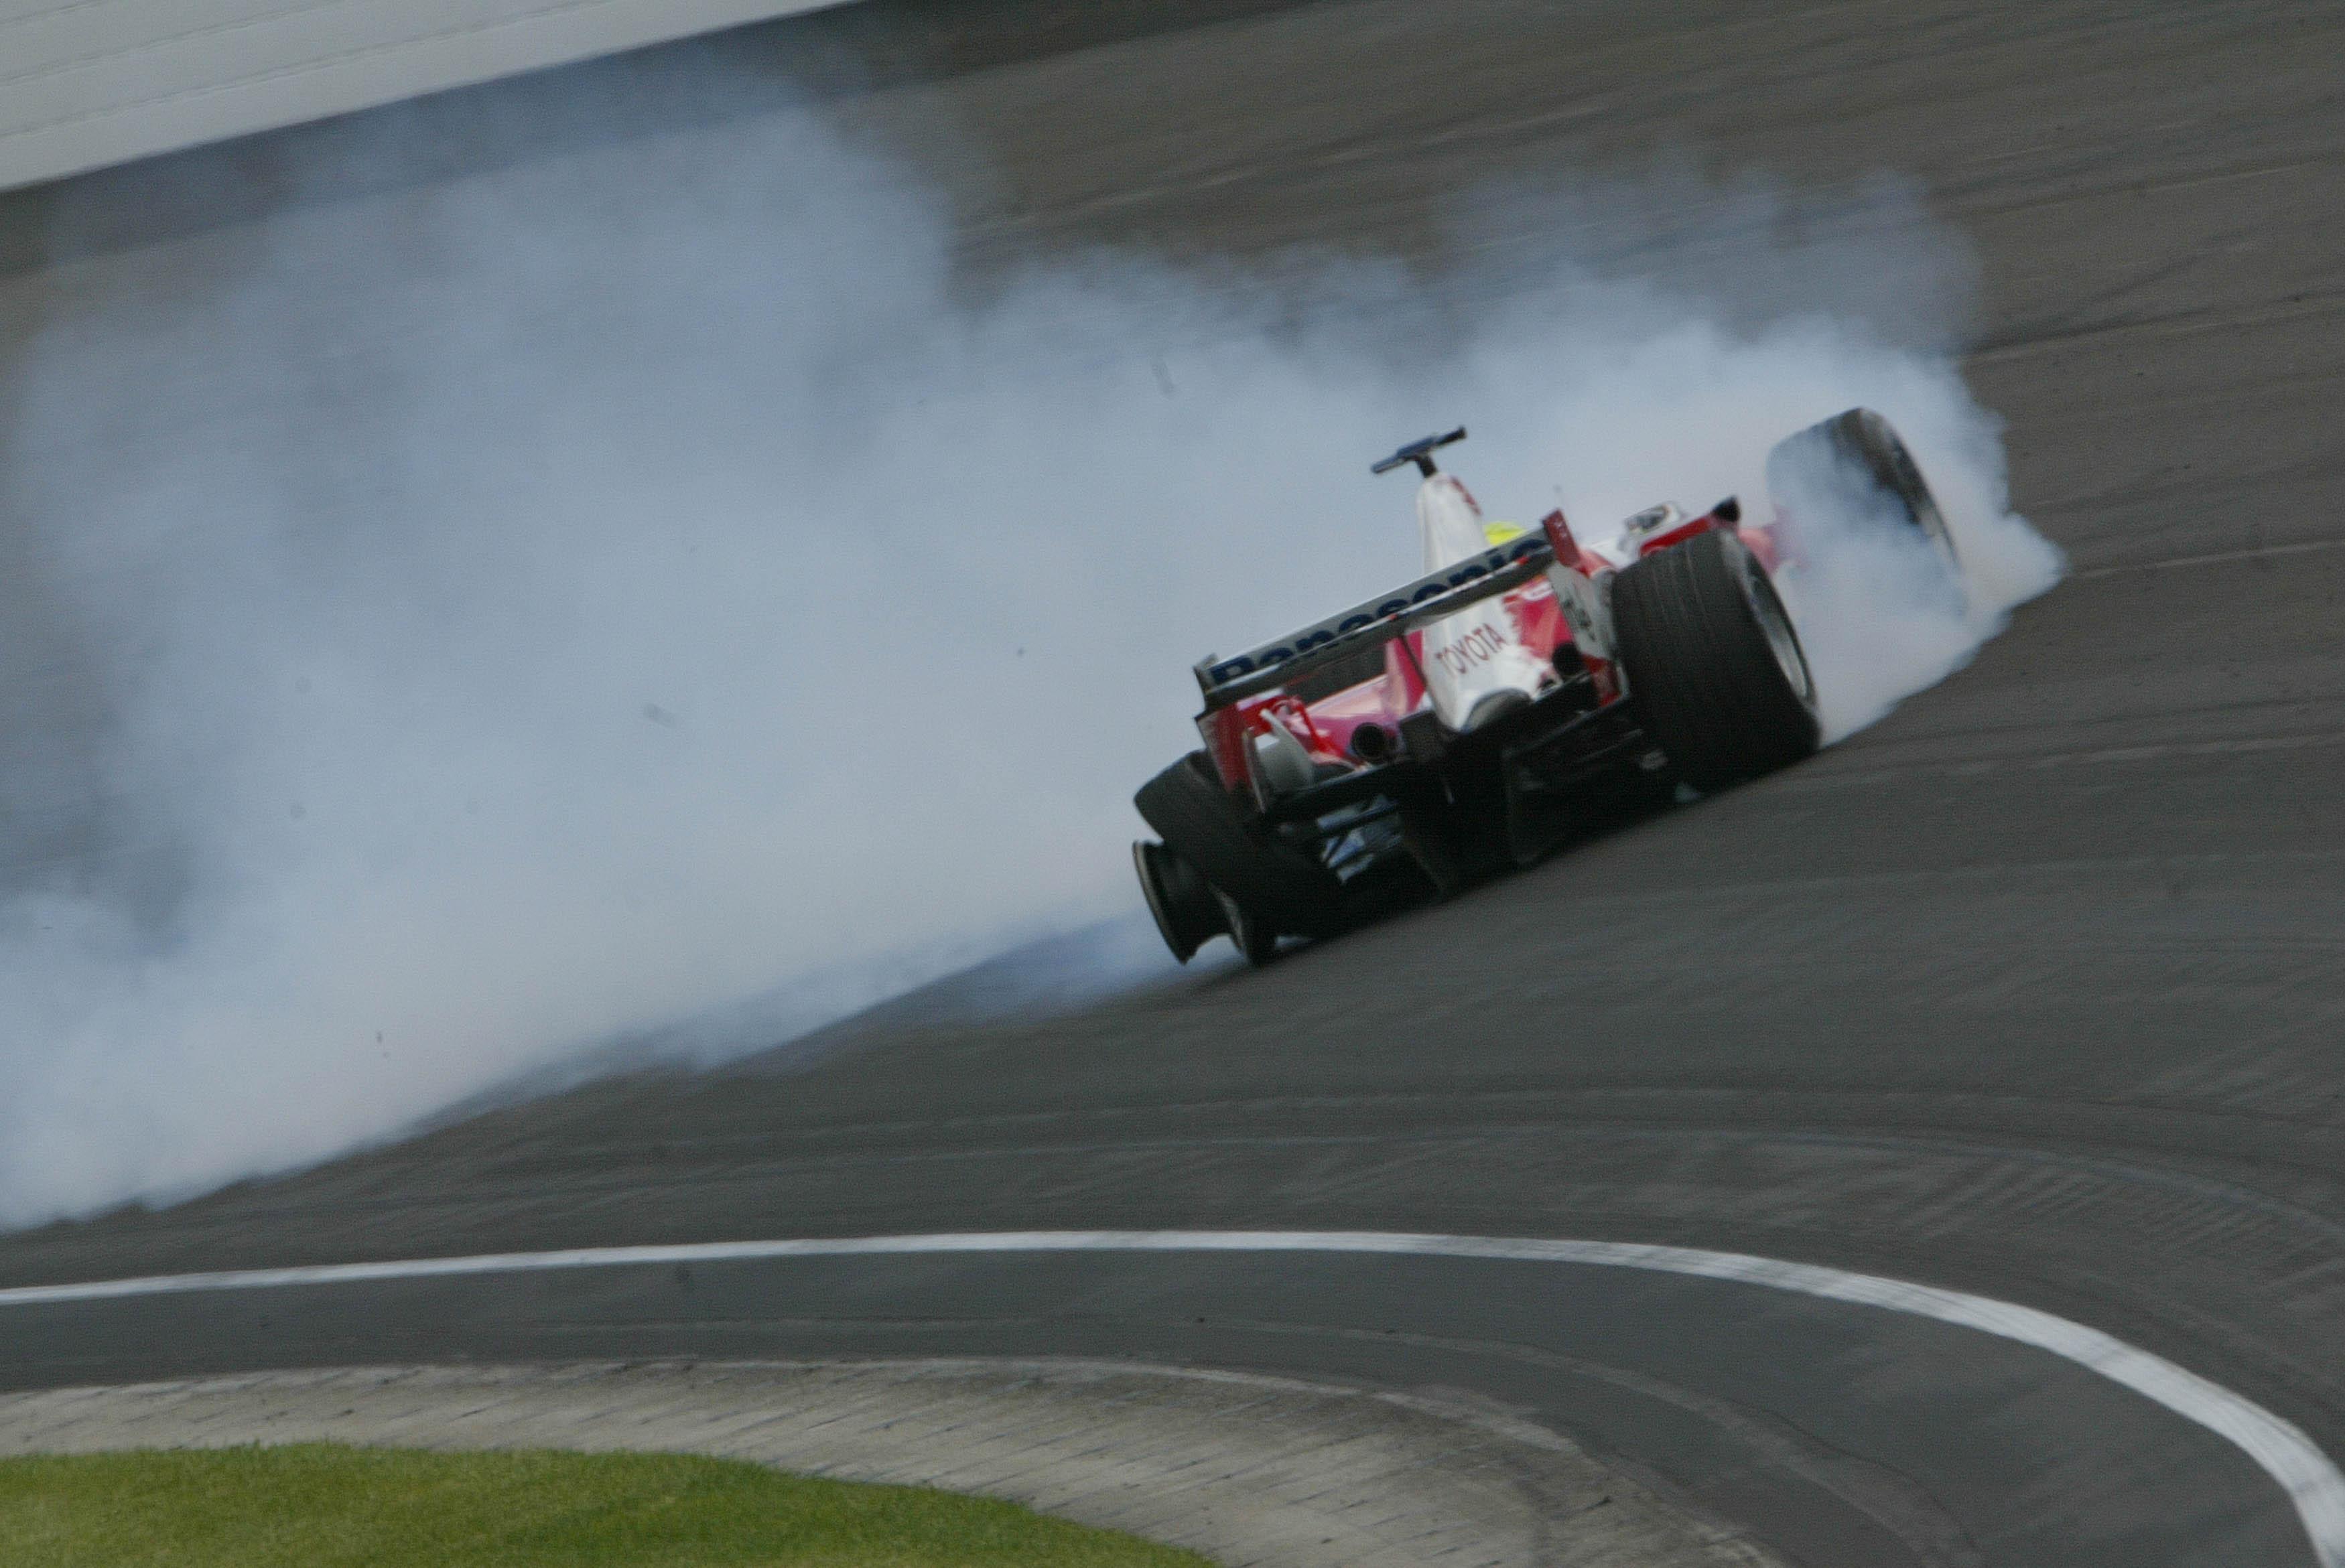 Ralf Schumacher Toyota US Grand Prix crash Indianapolis 2005